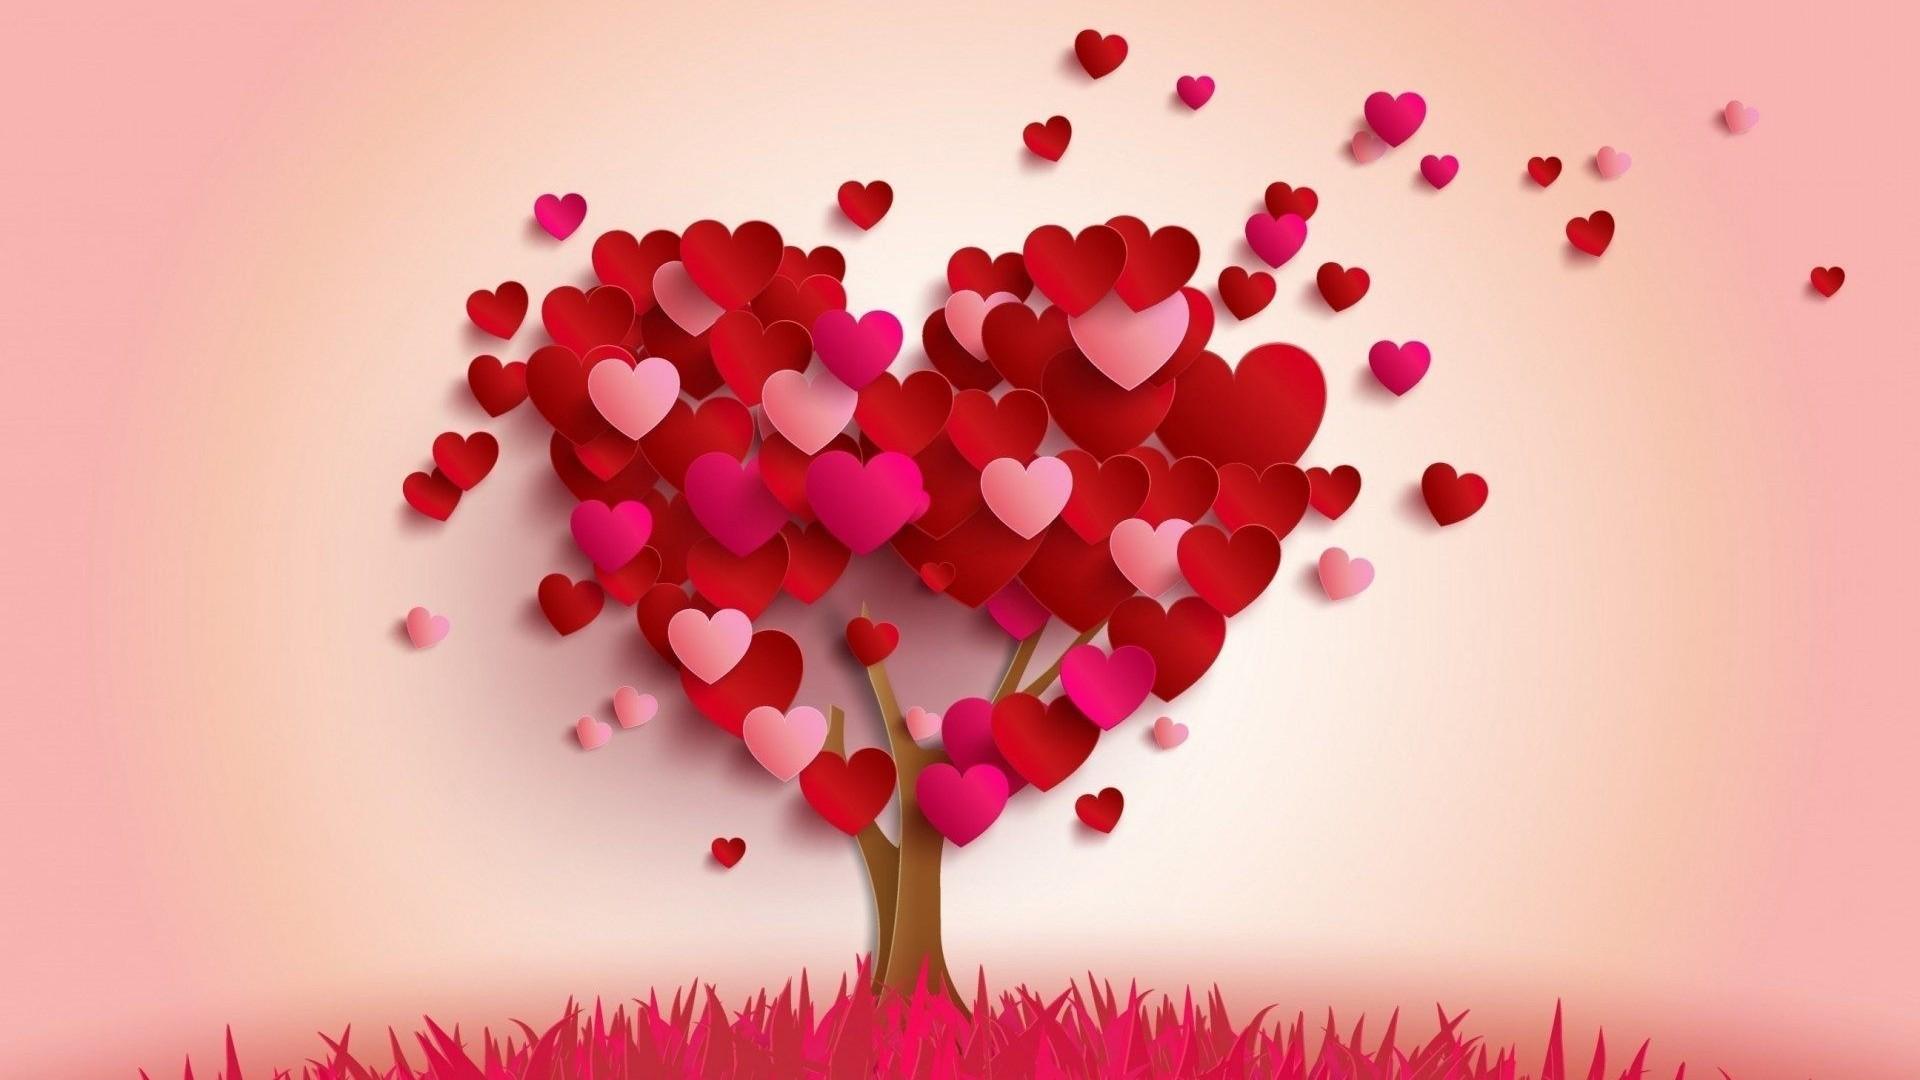 Love Wallpaper Images